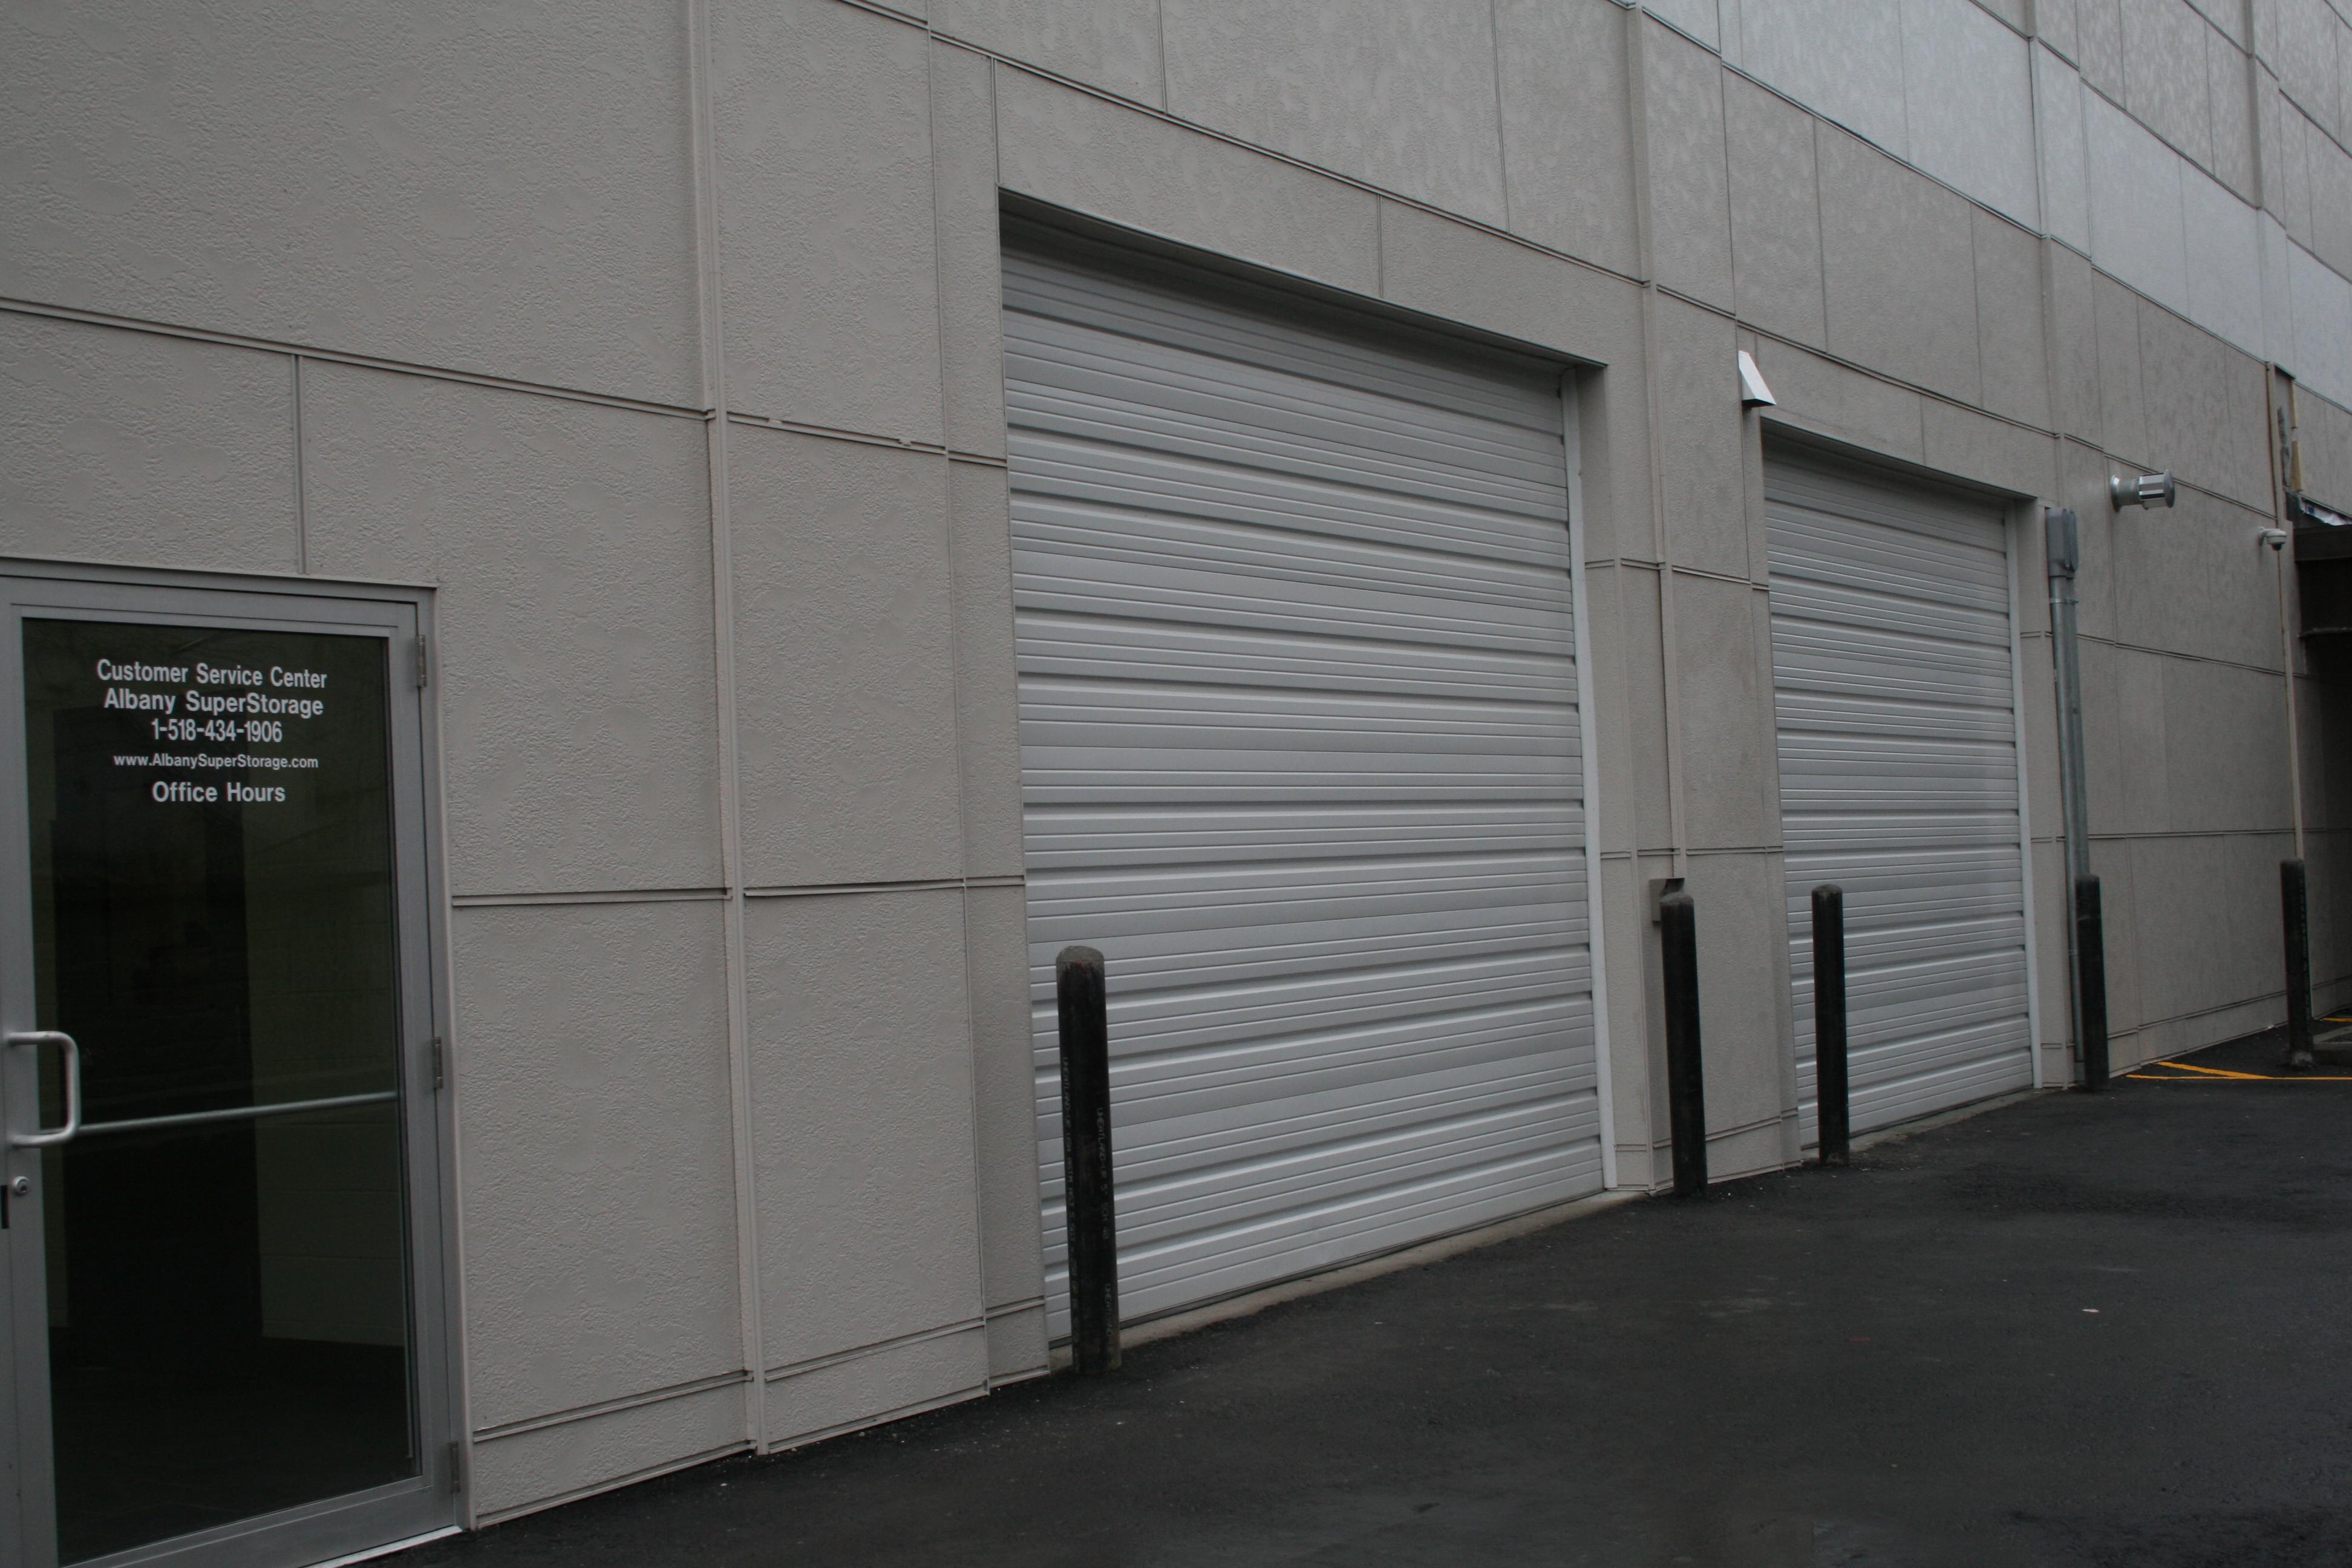 albany super storage storage unit loading dock